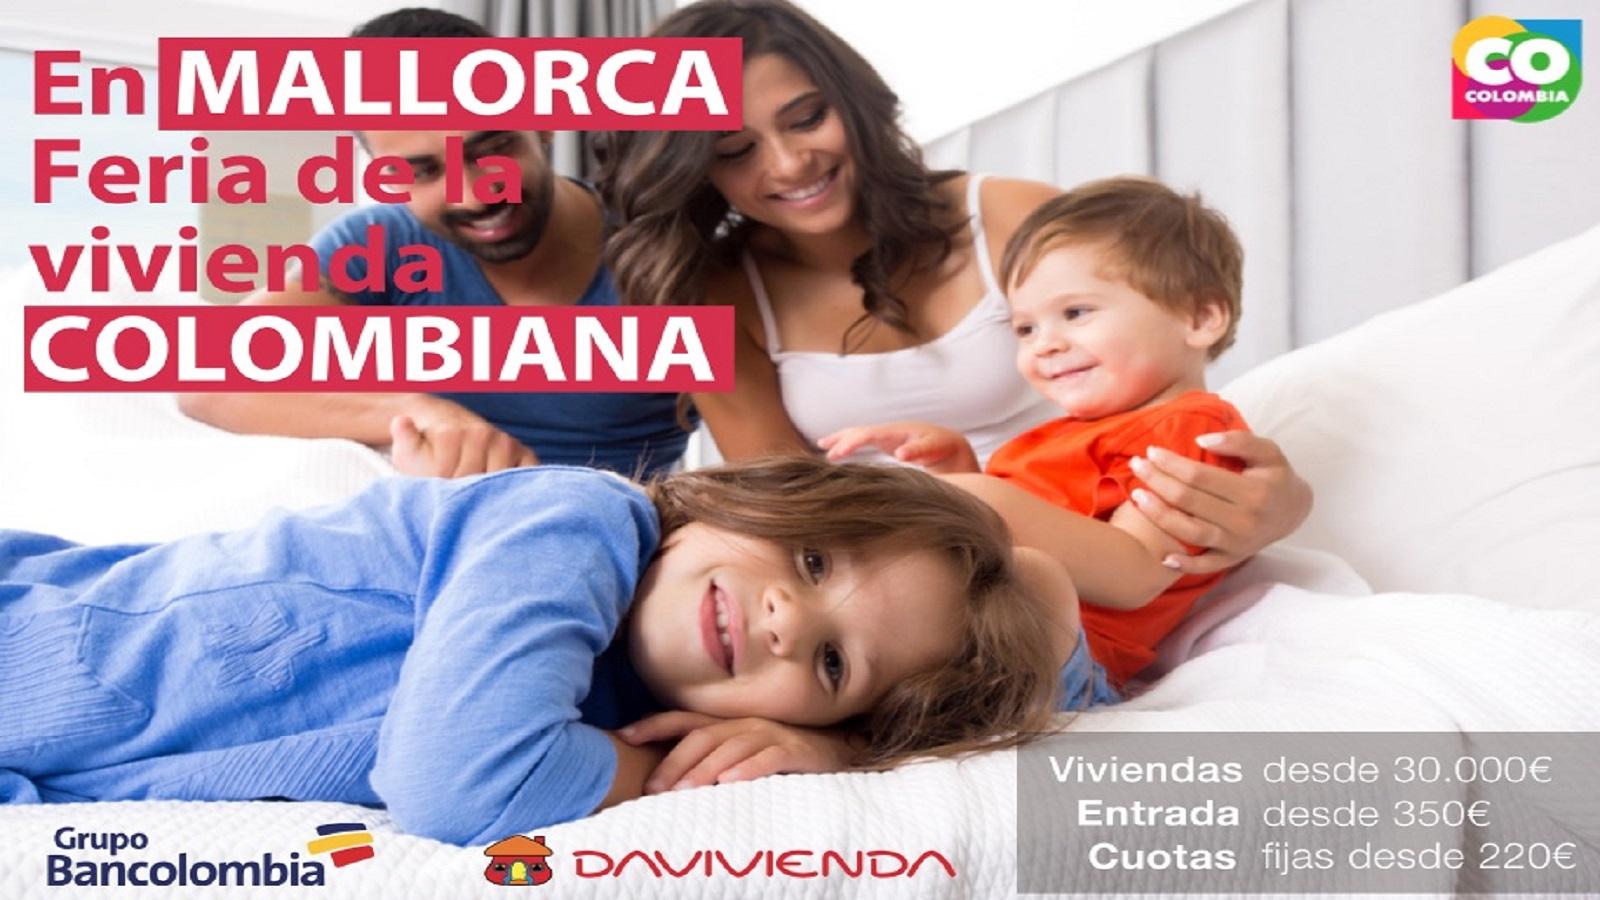 Feria de la vivienda colombiana en mallorca uni n andina - Constructoras en mallorca ...